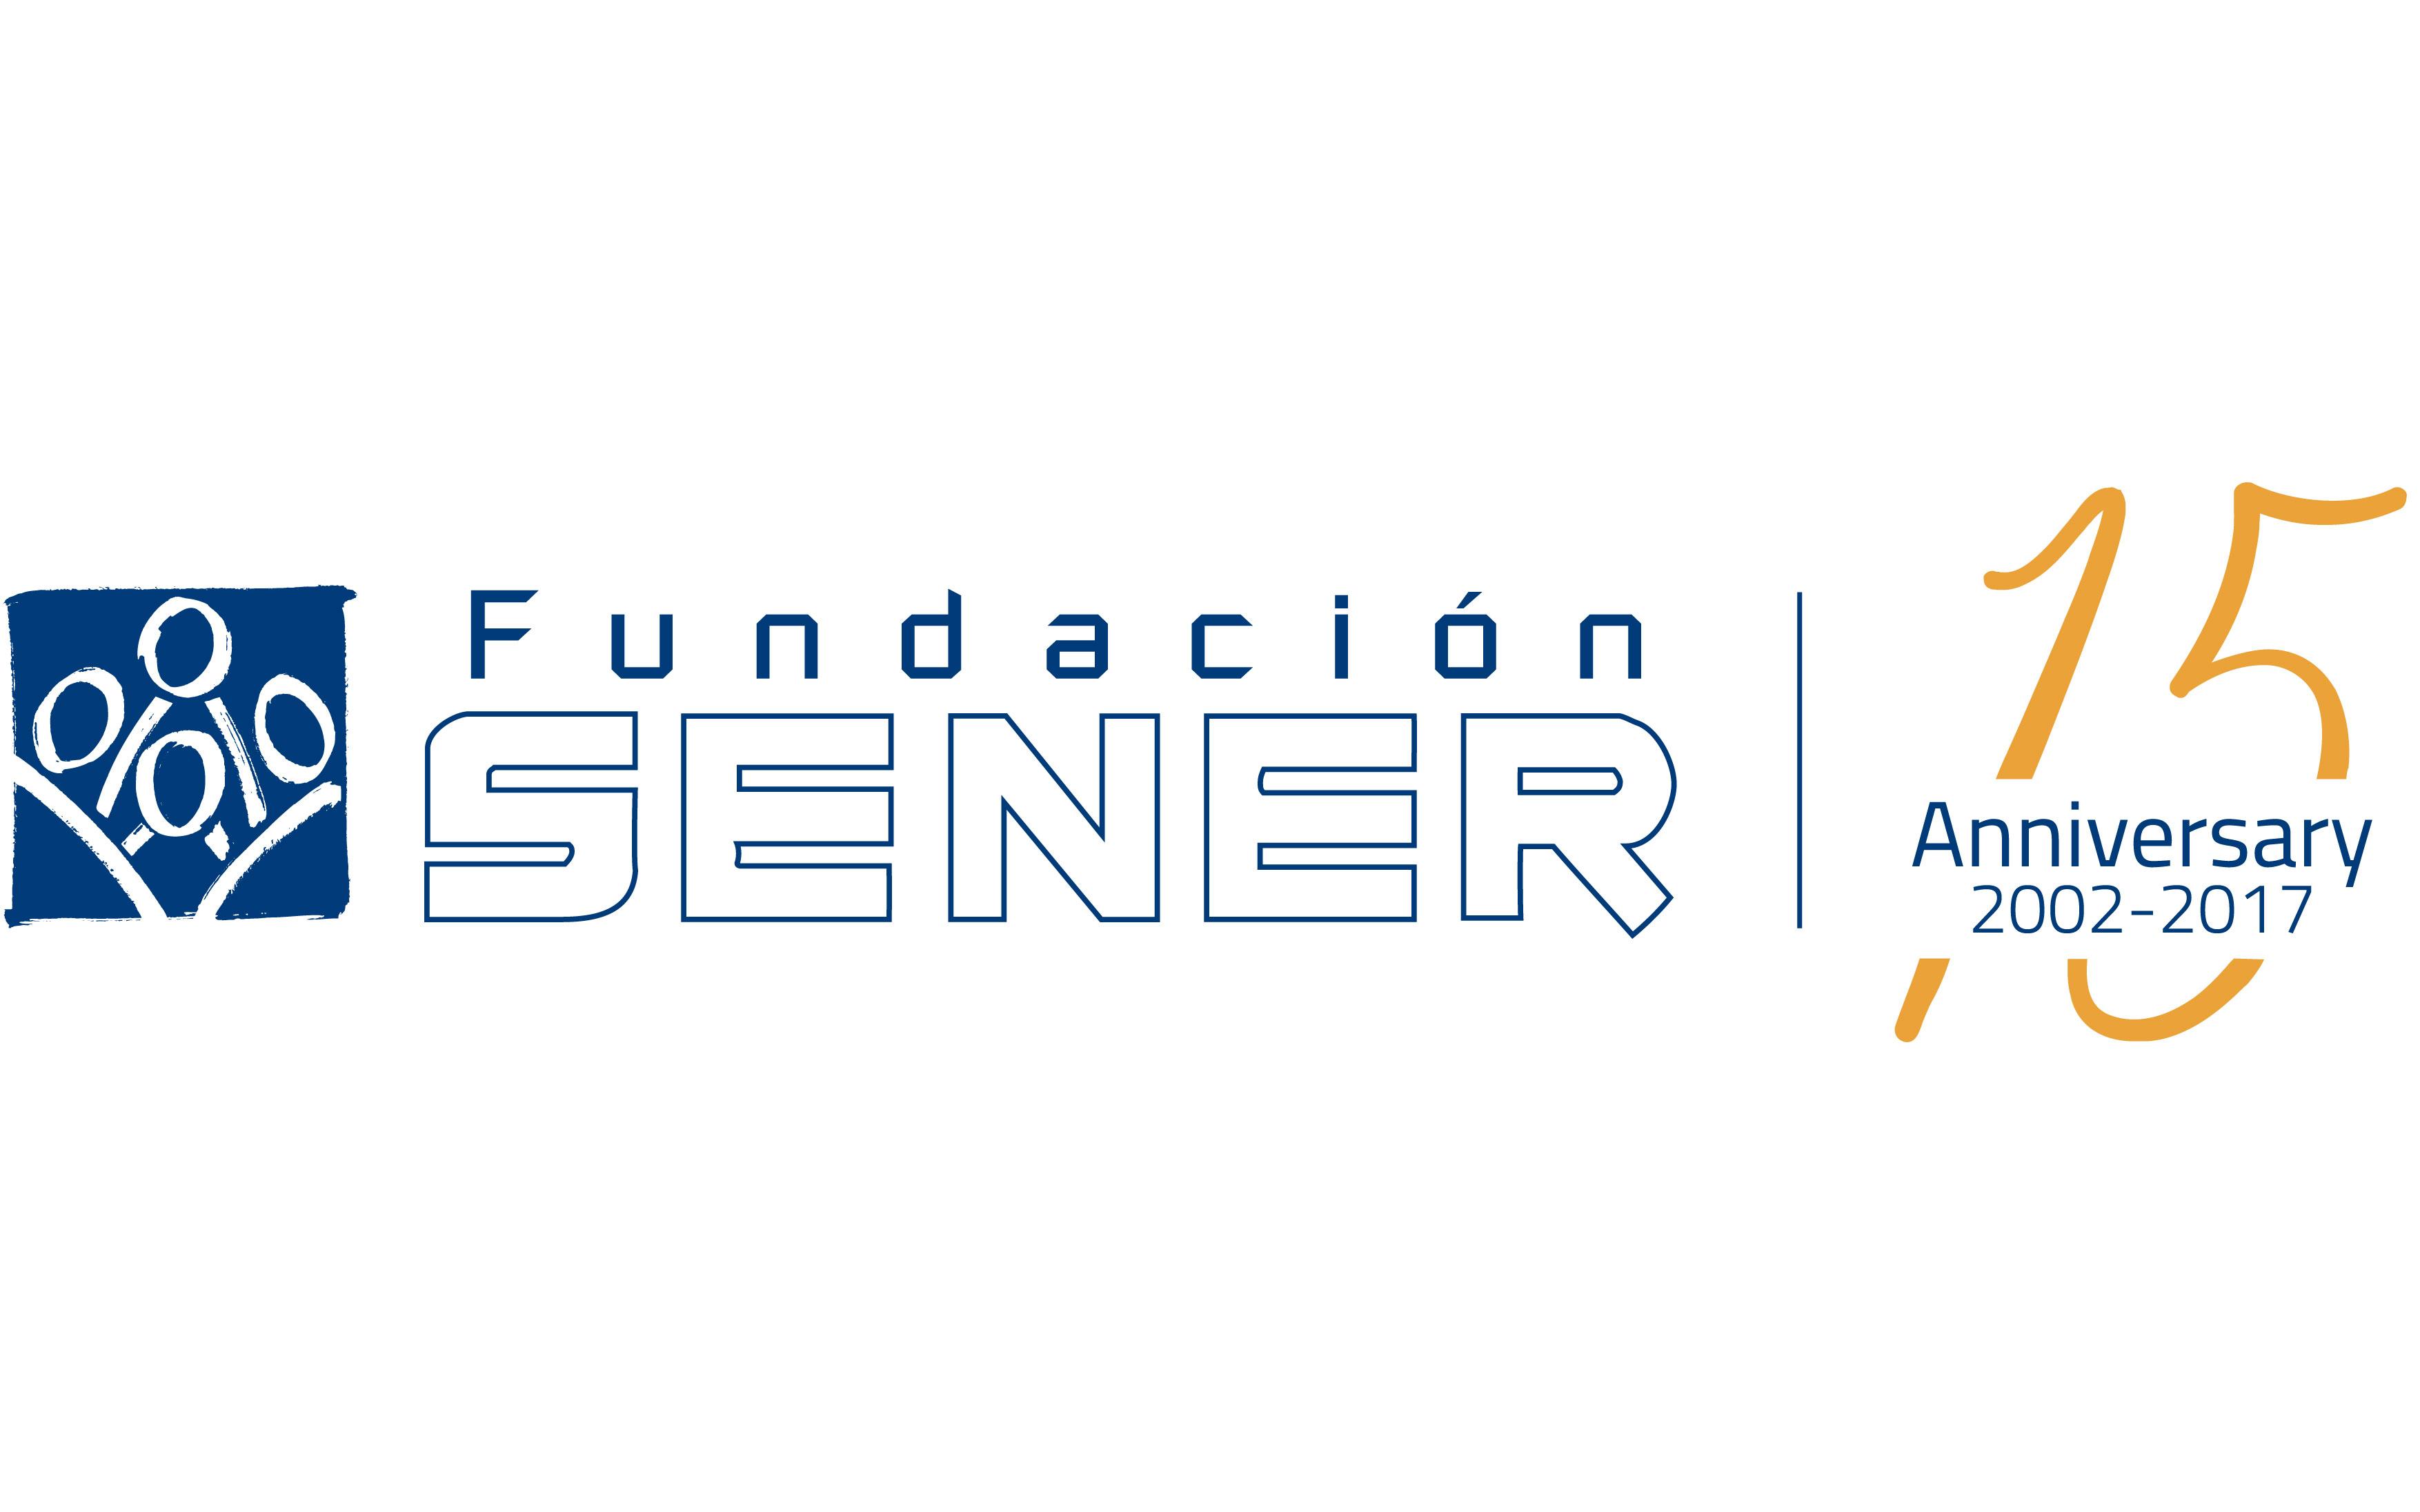 http://www.aerospace.sener/ecm-images/fundacion-sener-15-aniversario-1_replica_replica